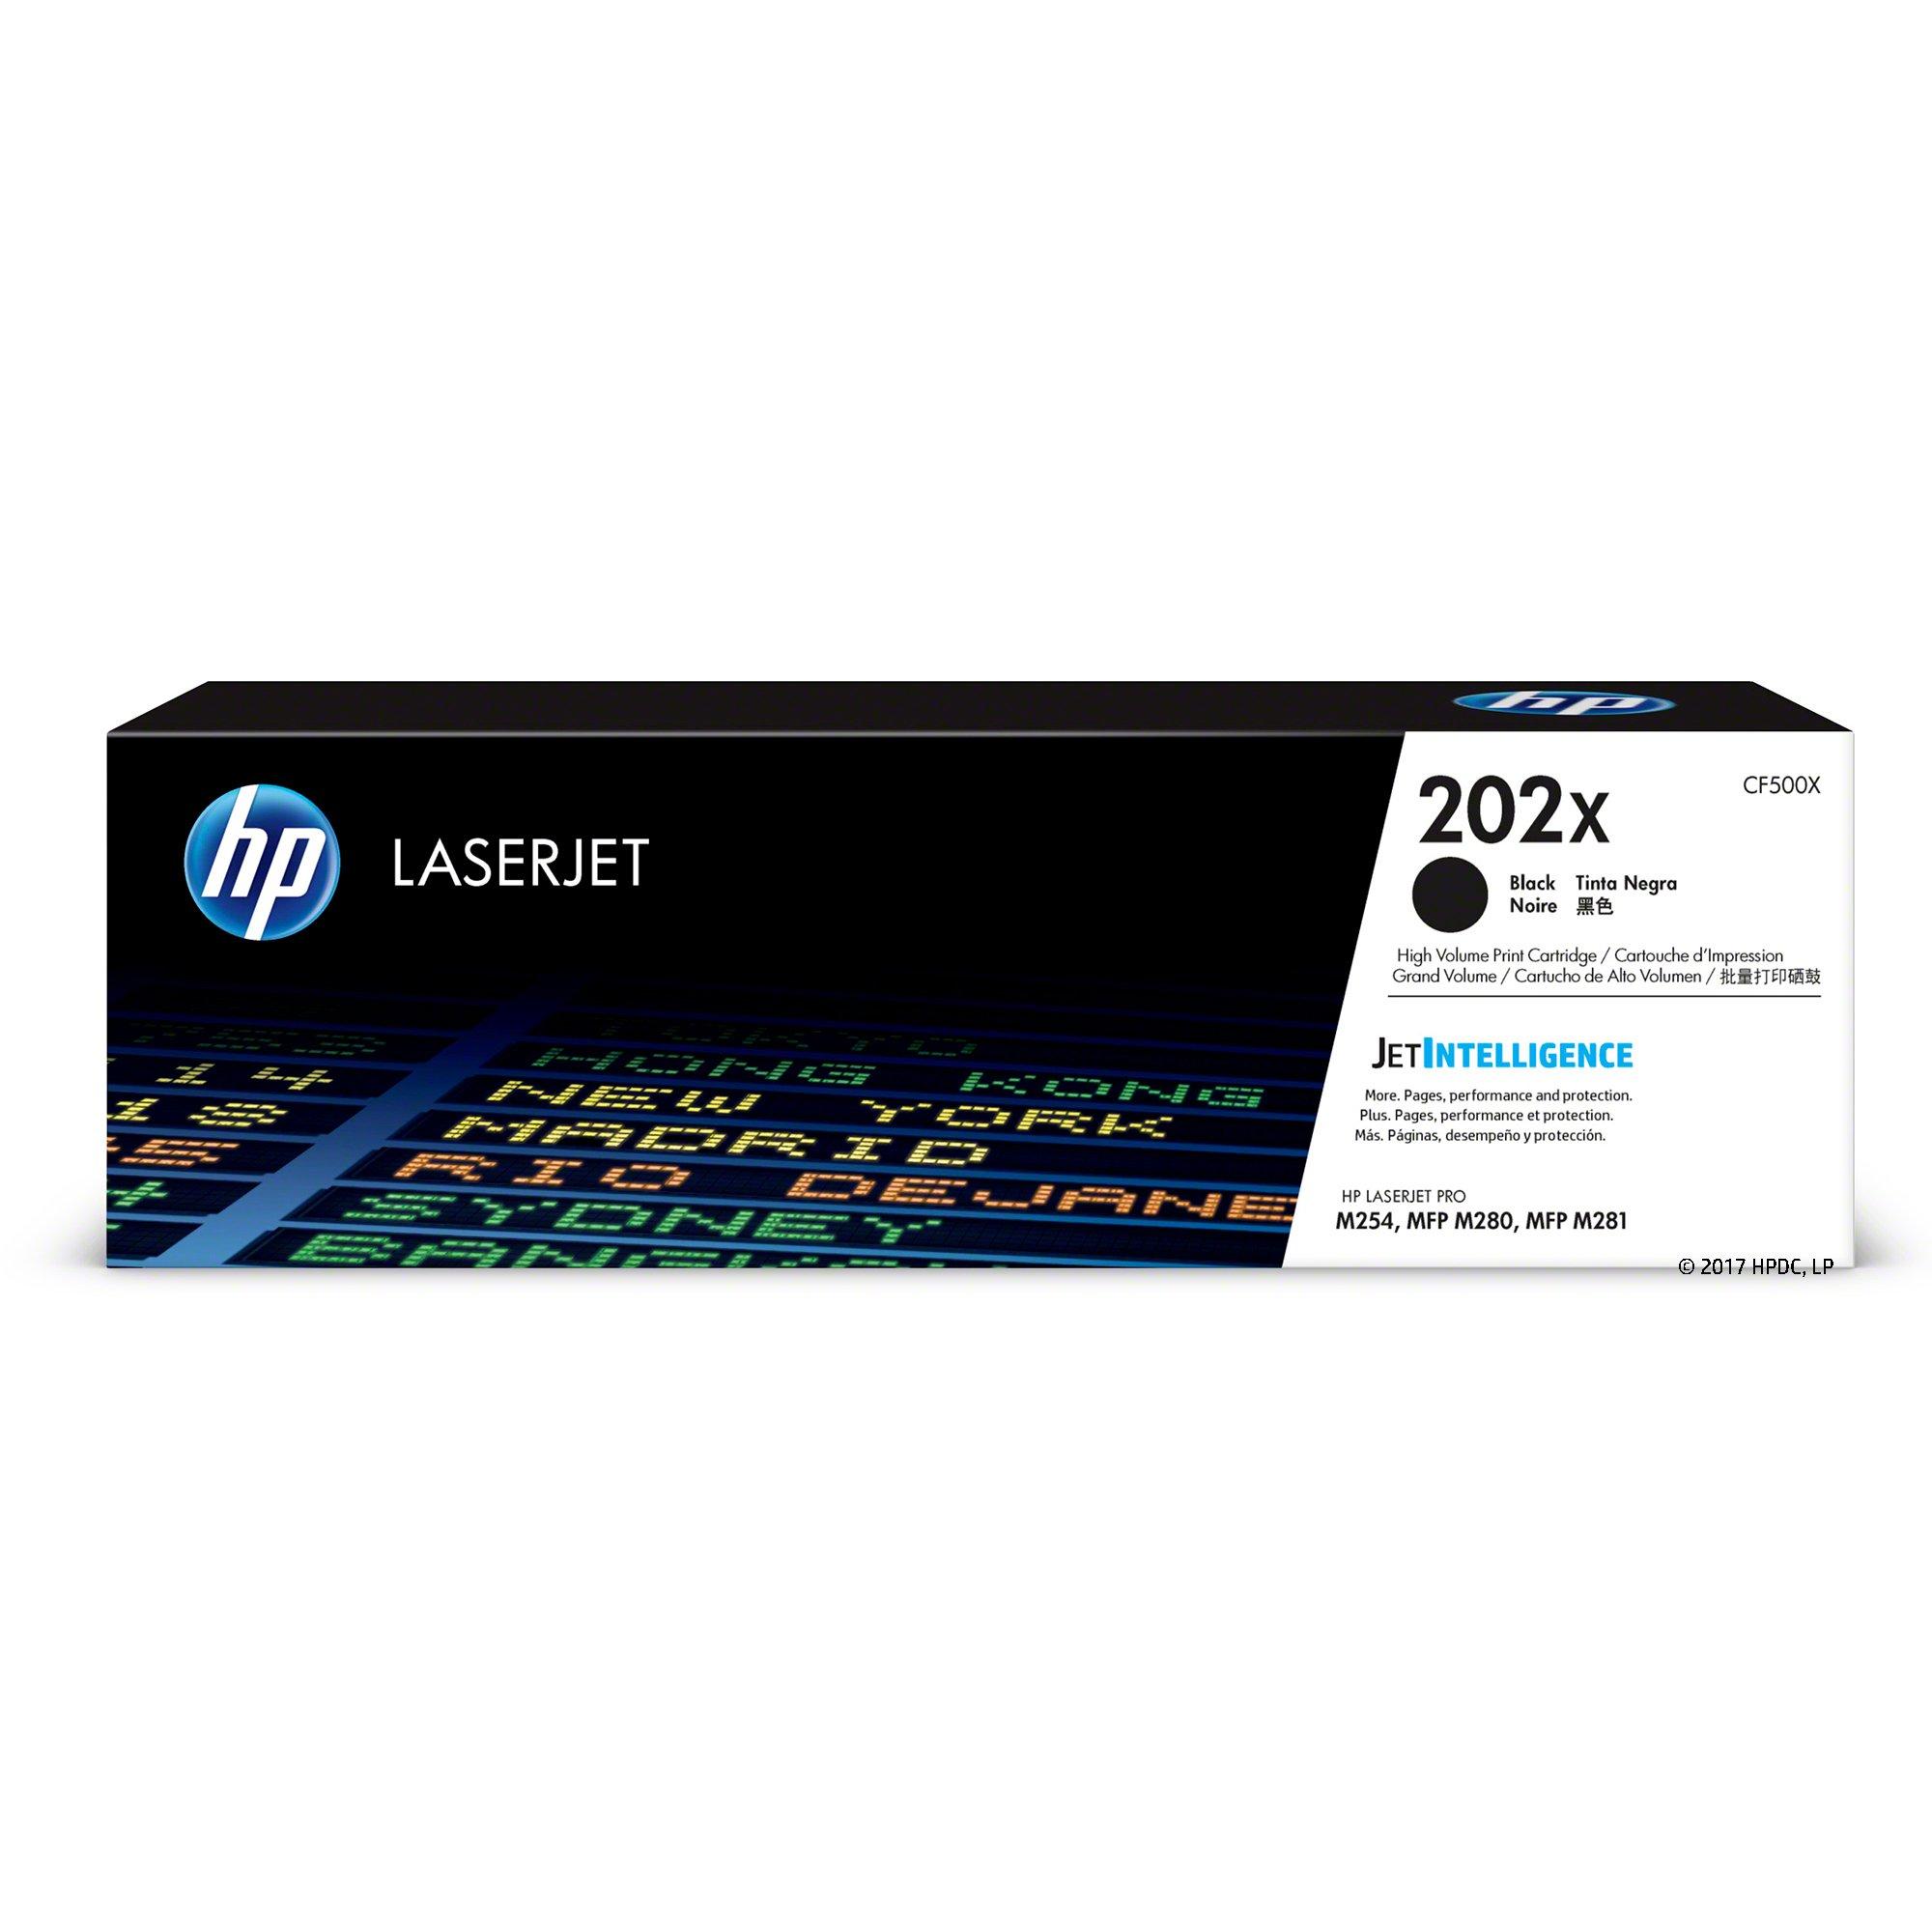 HP 202X (CF500X) Black High Yield Original Toner Cartridge for HP Laserjet Pro M254 M281cdw M281dw